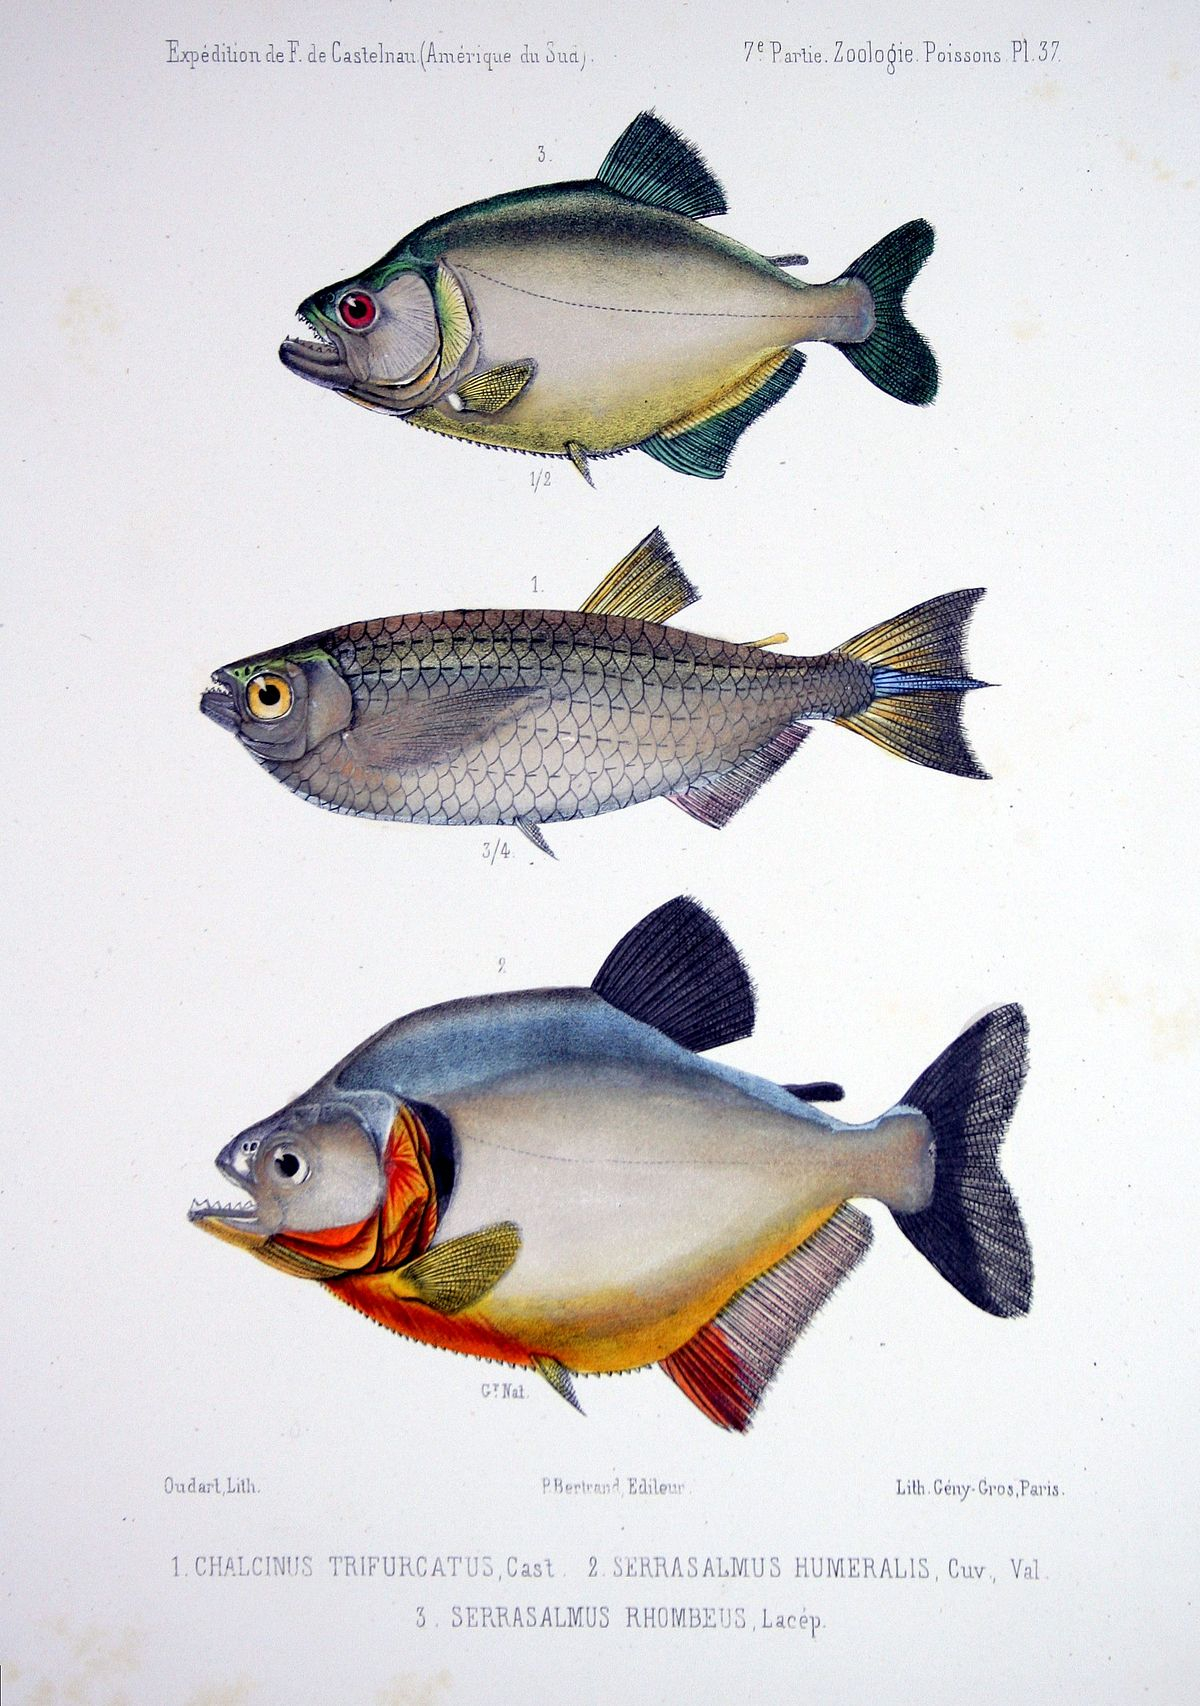 Piraña - Wikipedia, la enciclopedia libre